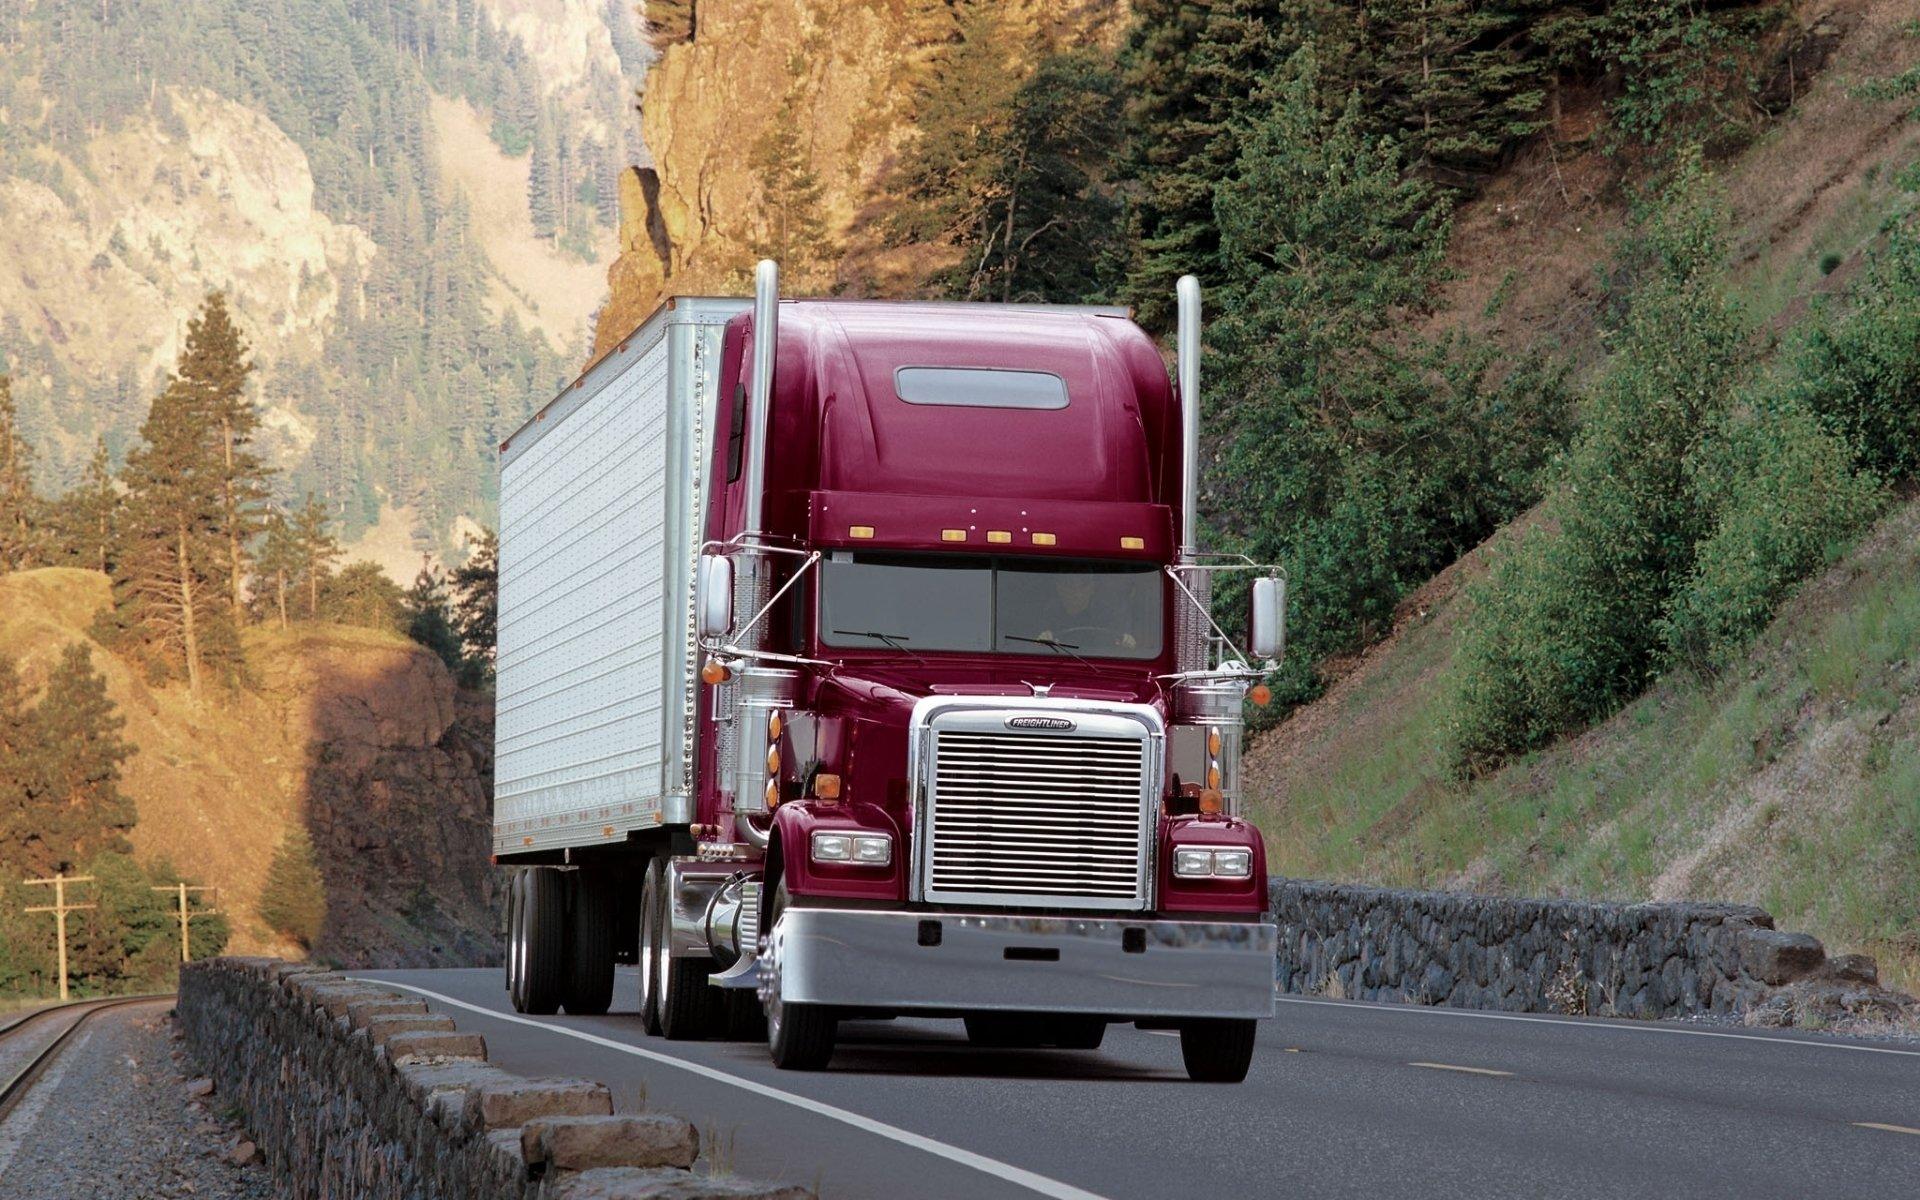 графика грузовик автомобиль бесплатно